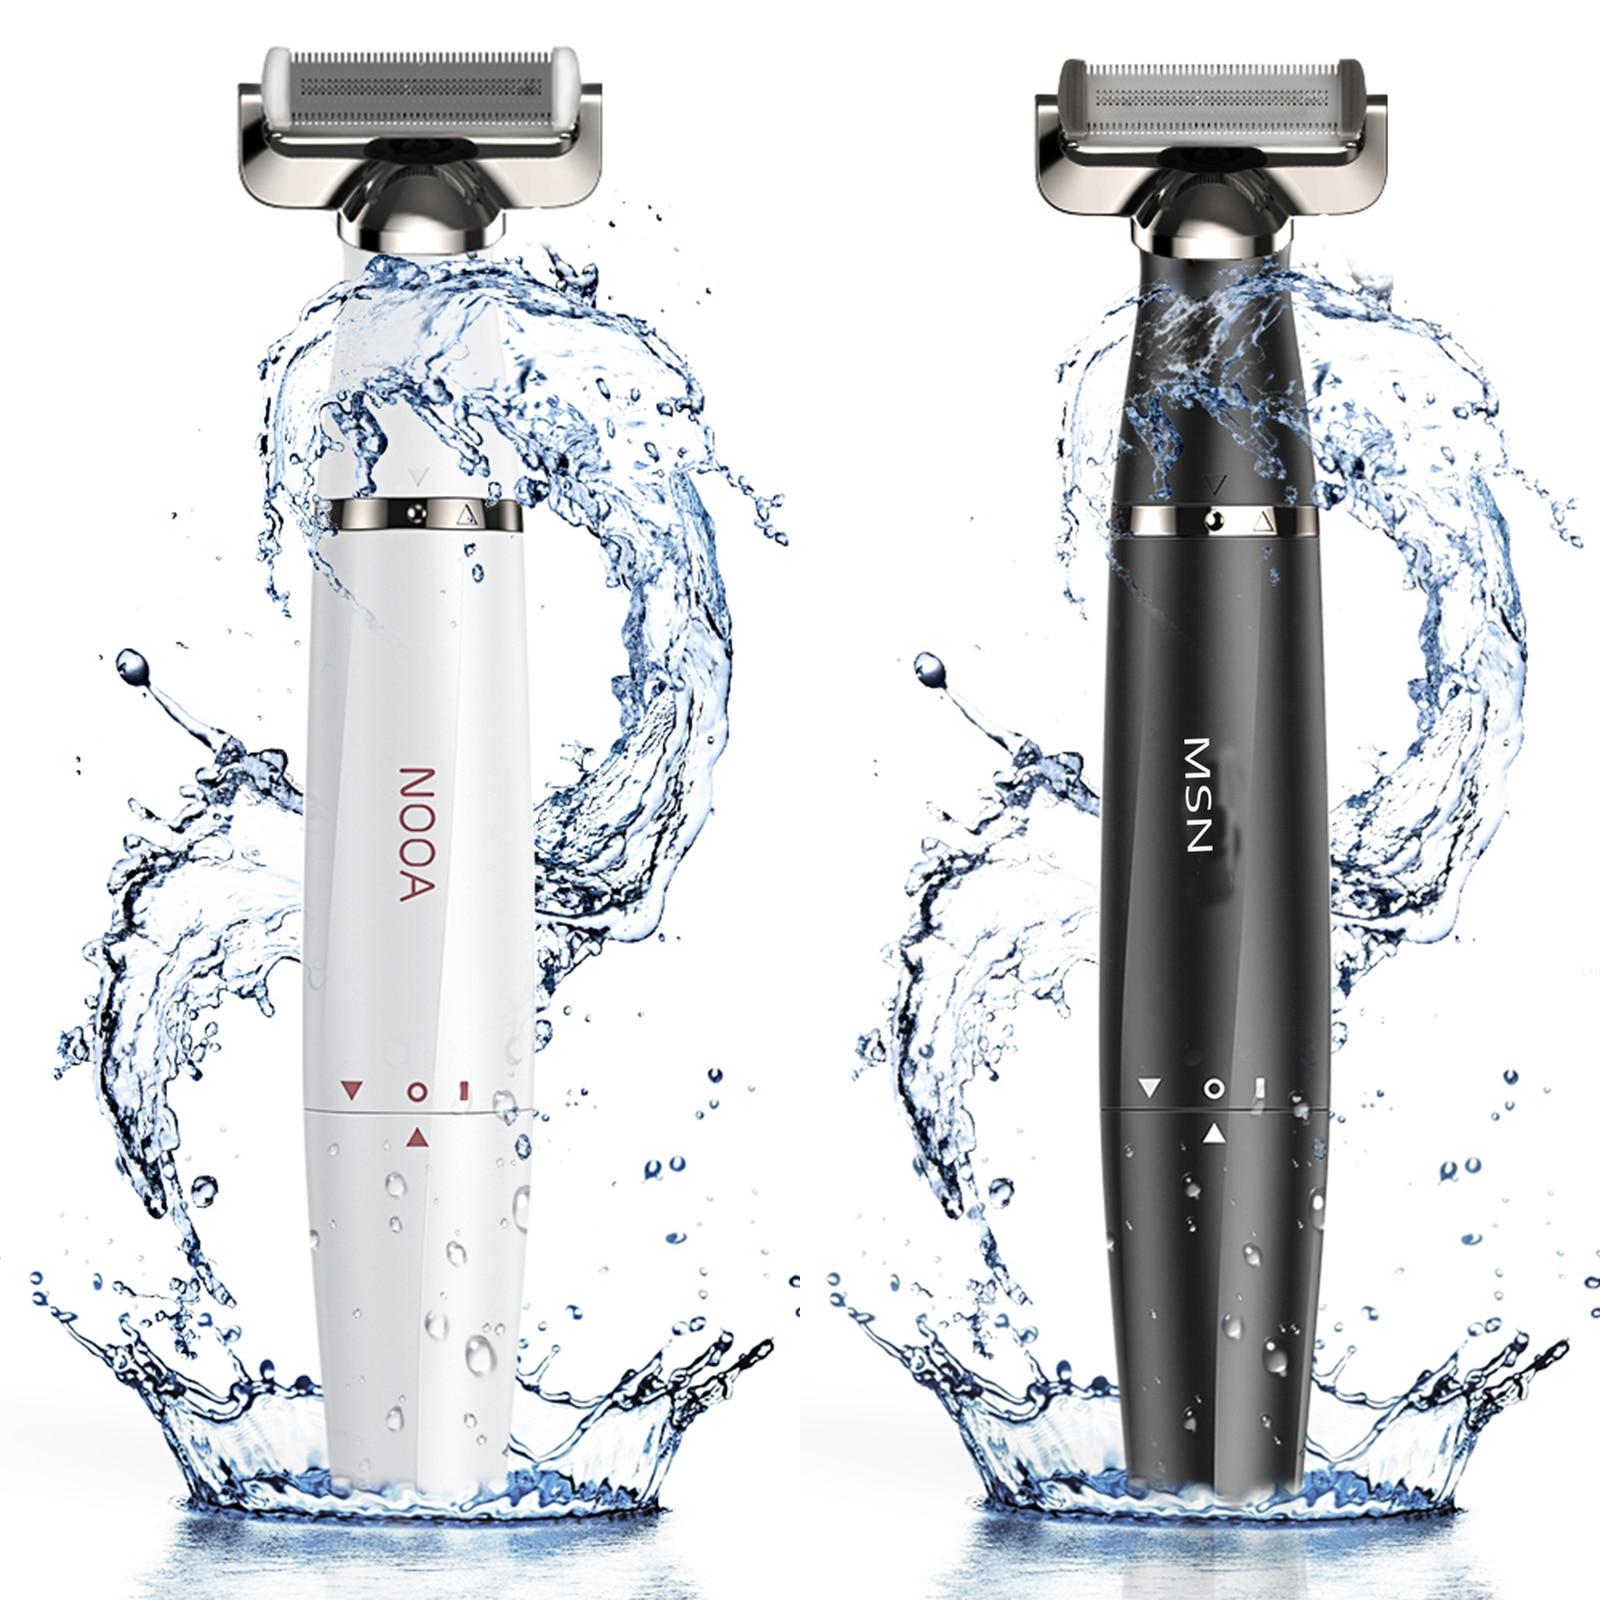 Electric shaver for man Body hair trimmer bikini Trimmer razor For Intimate Areas epilator for women